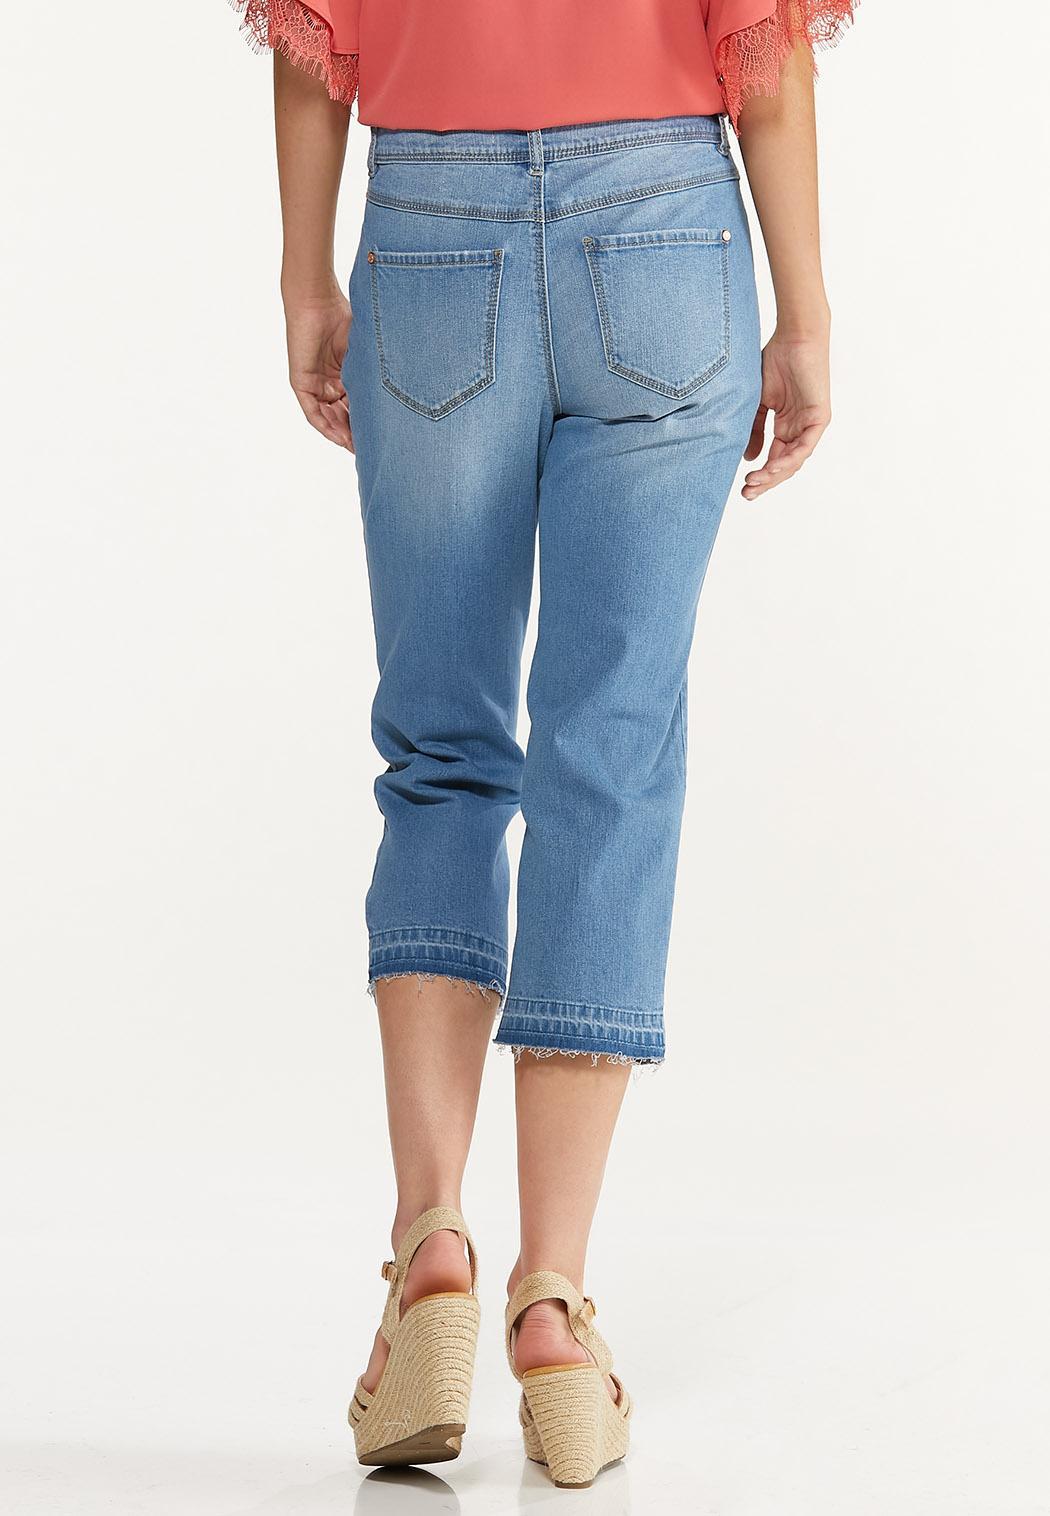 Cropped Release Hem Jeans (Item #44589318)